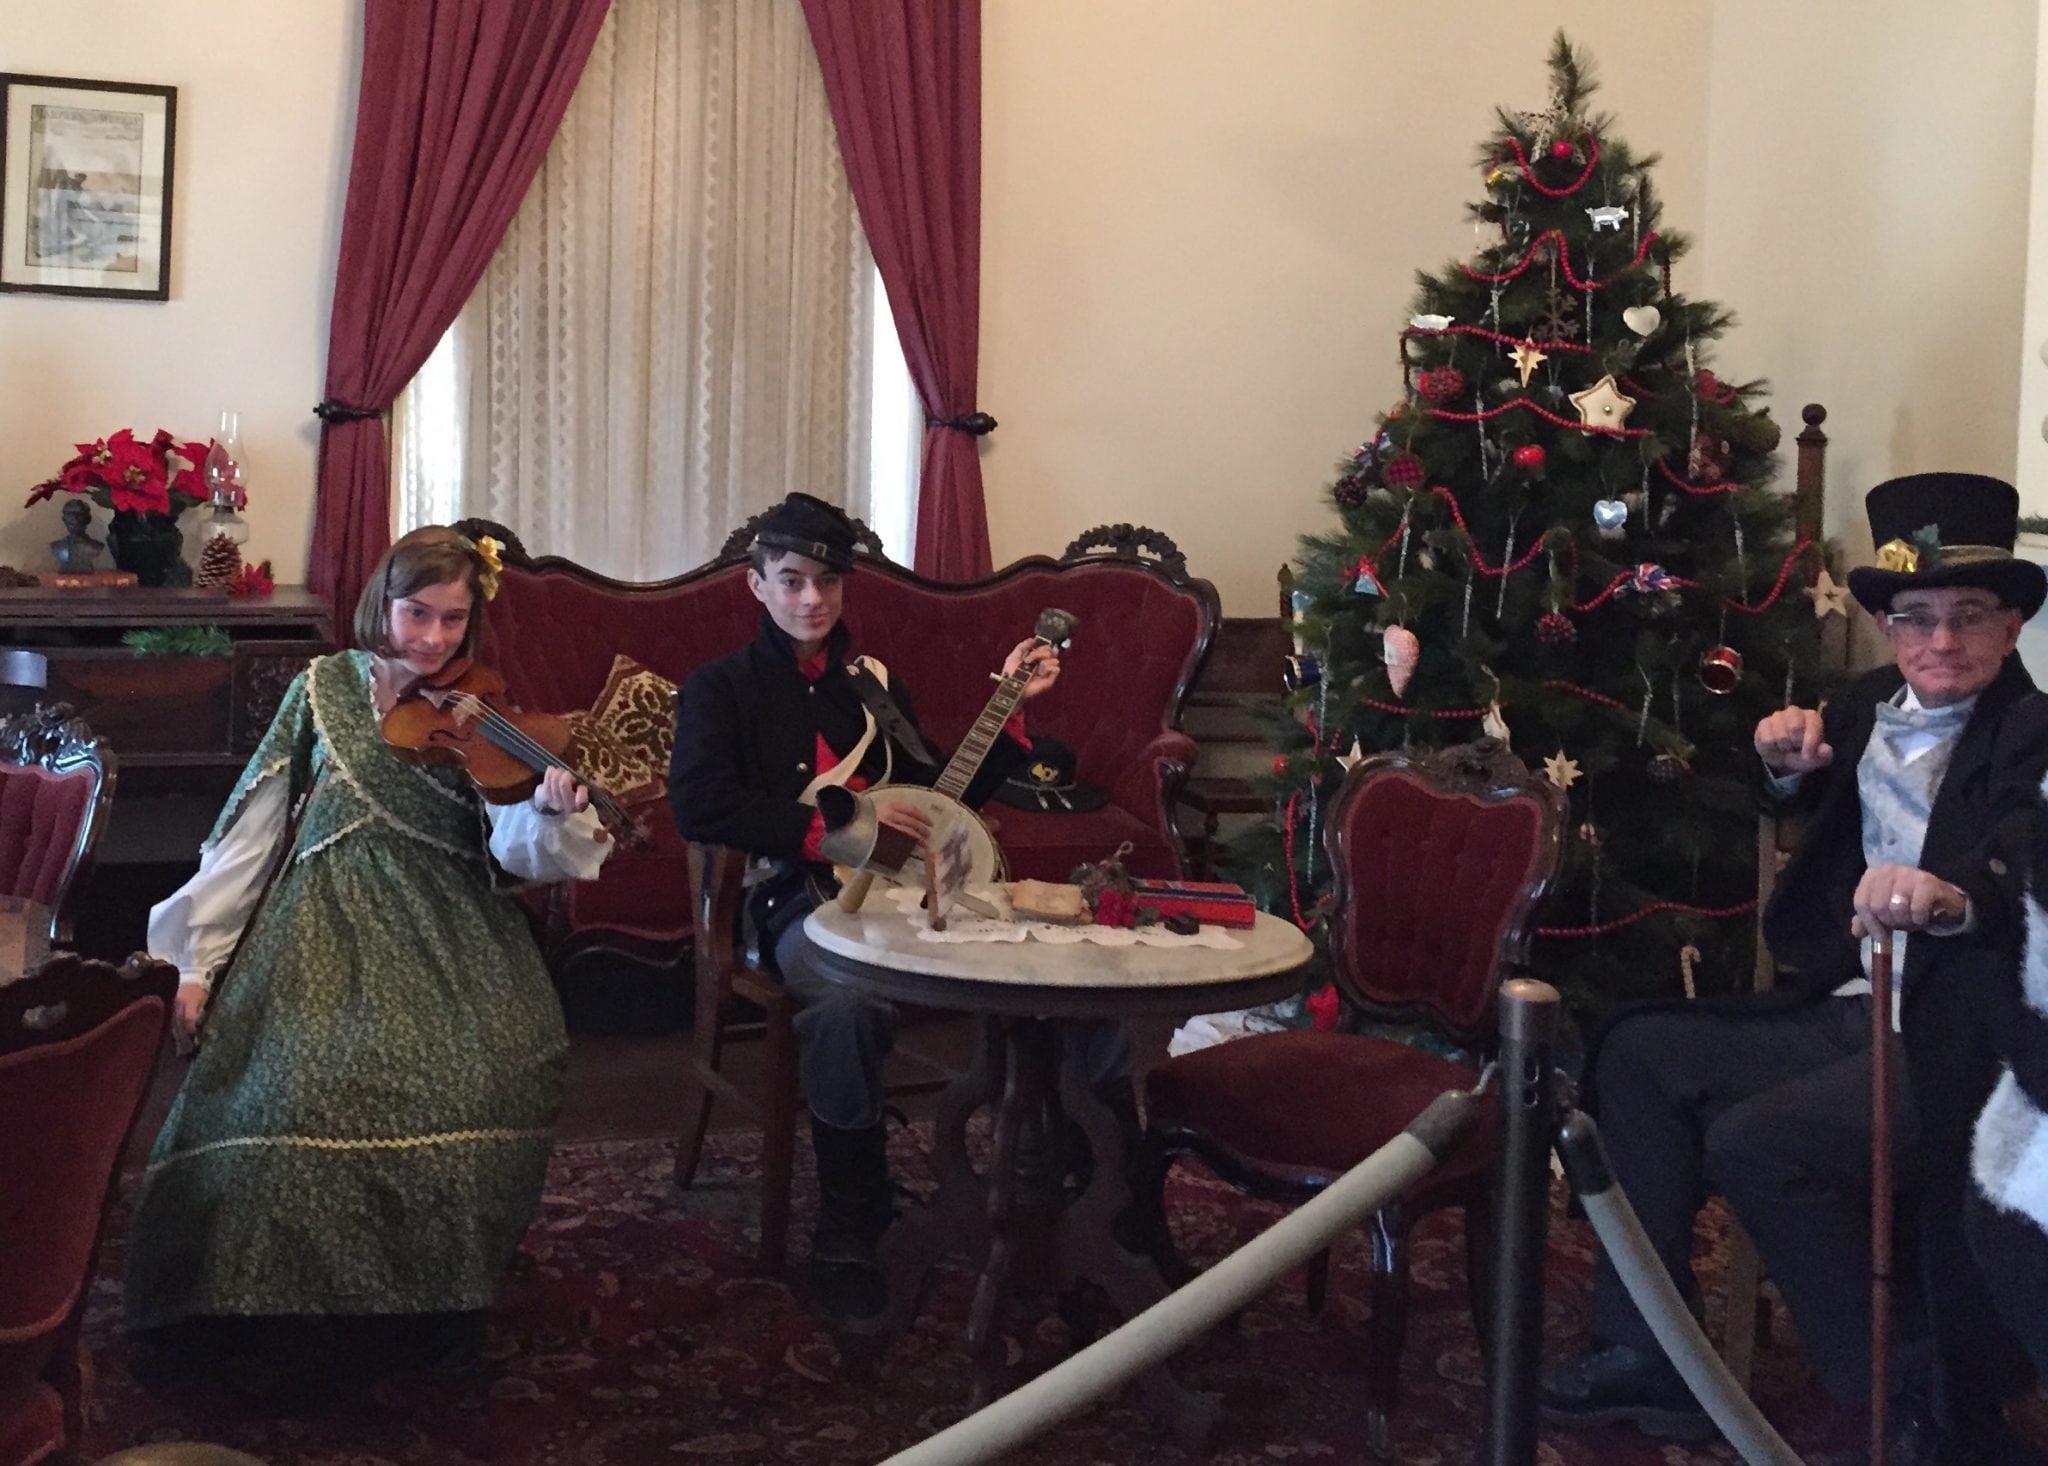 Wilmington's Historic Christmas Celebrations